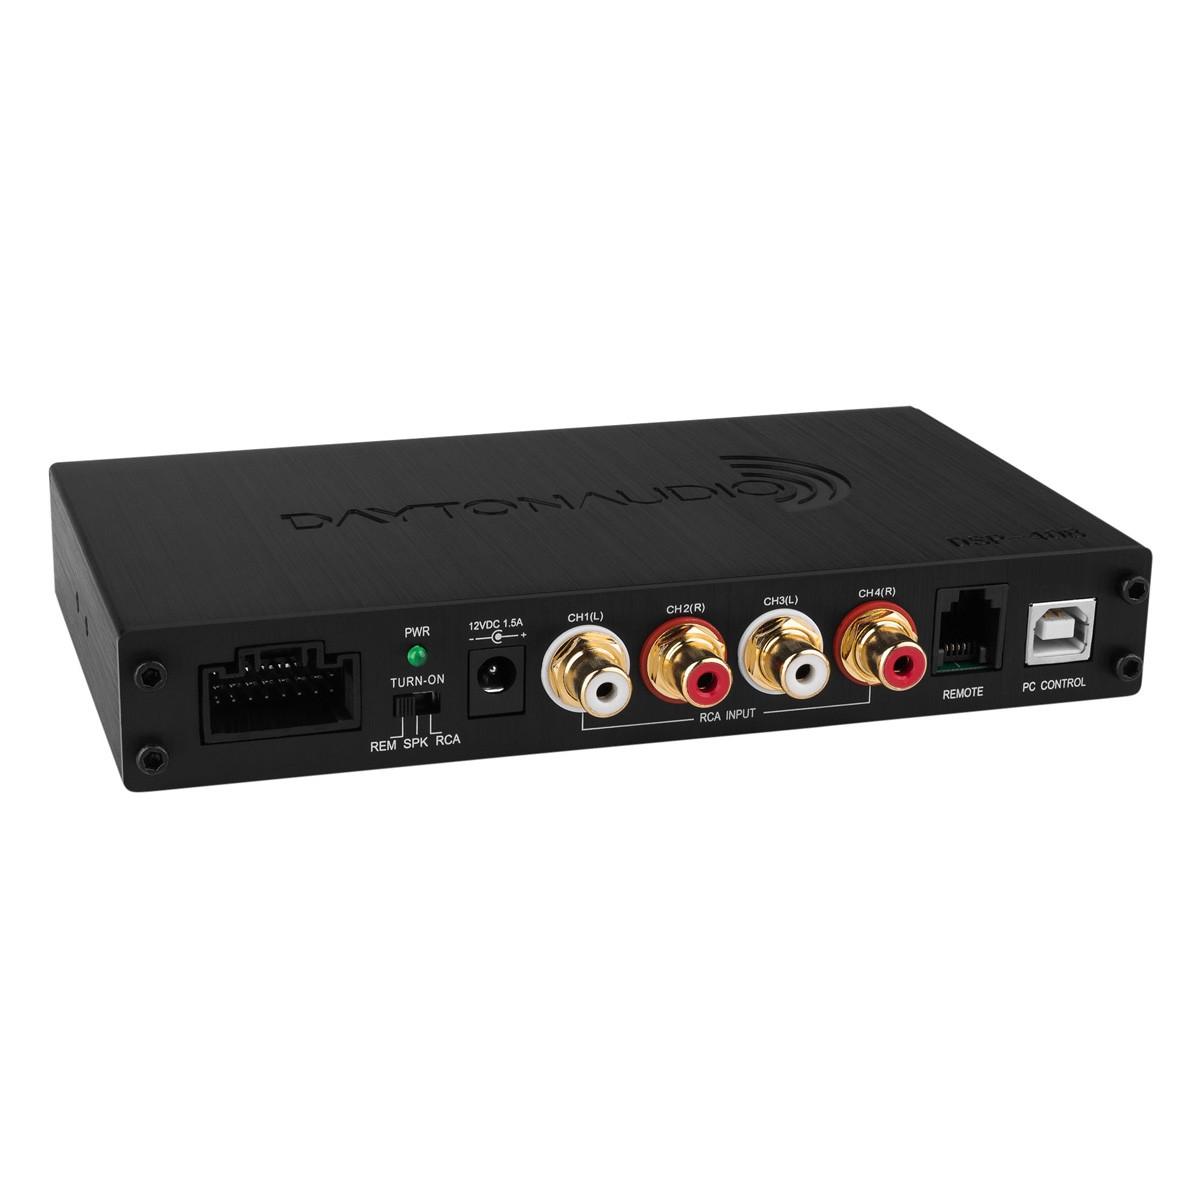 DAYTON AUDIO DSP-408 4x8 Digital Audio Processor DSP ADAU1701 SigmaDSP 25/56bit 4 to 8 Channels